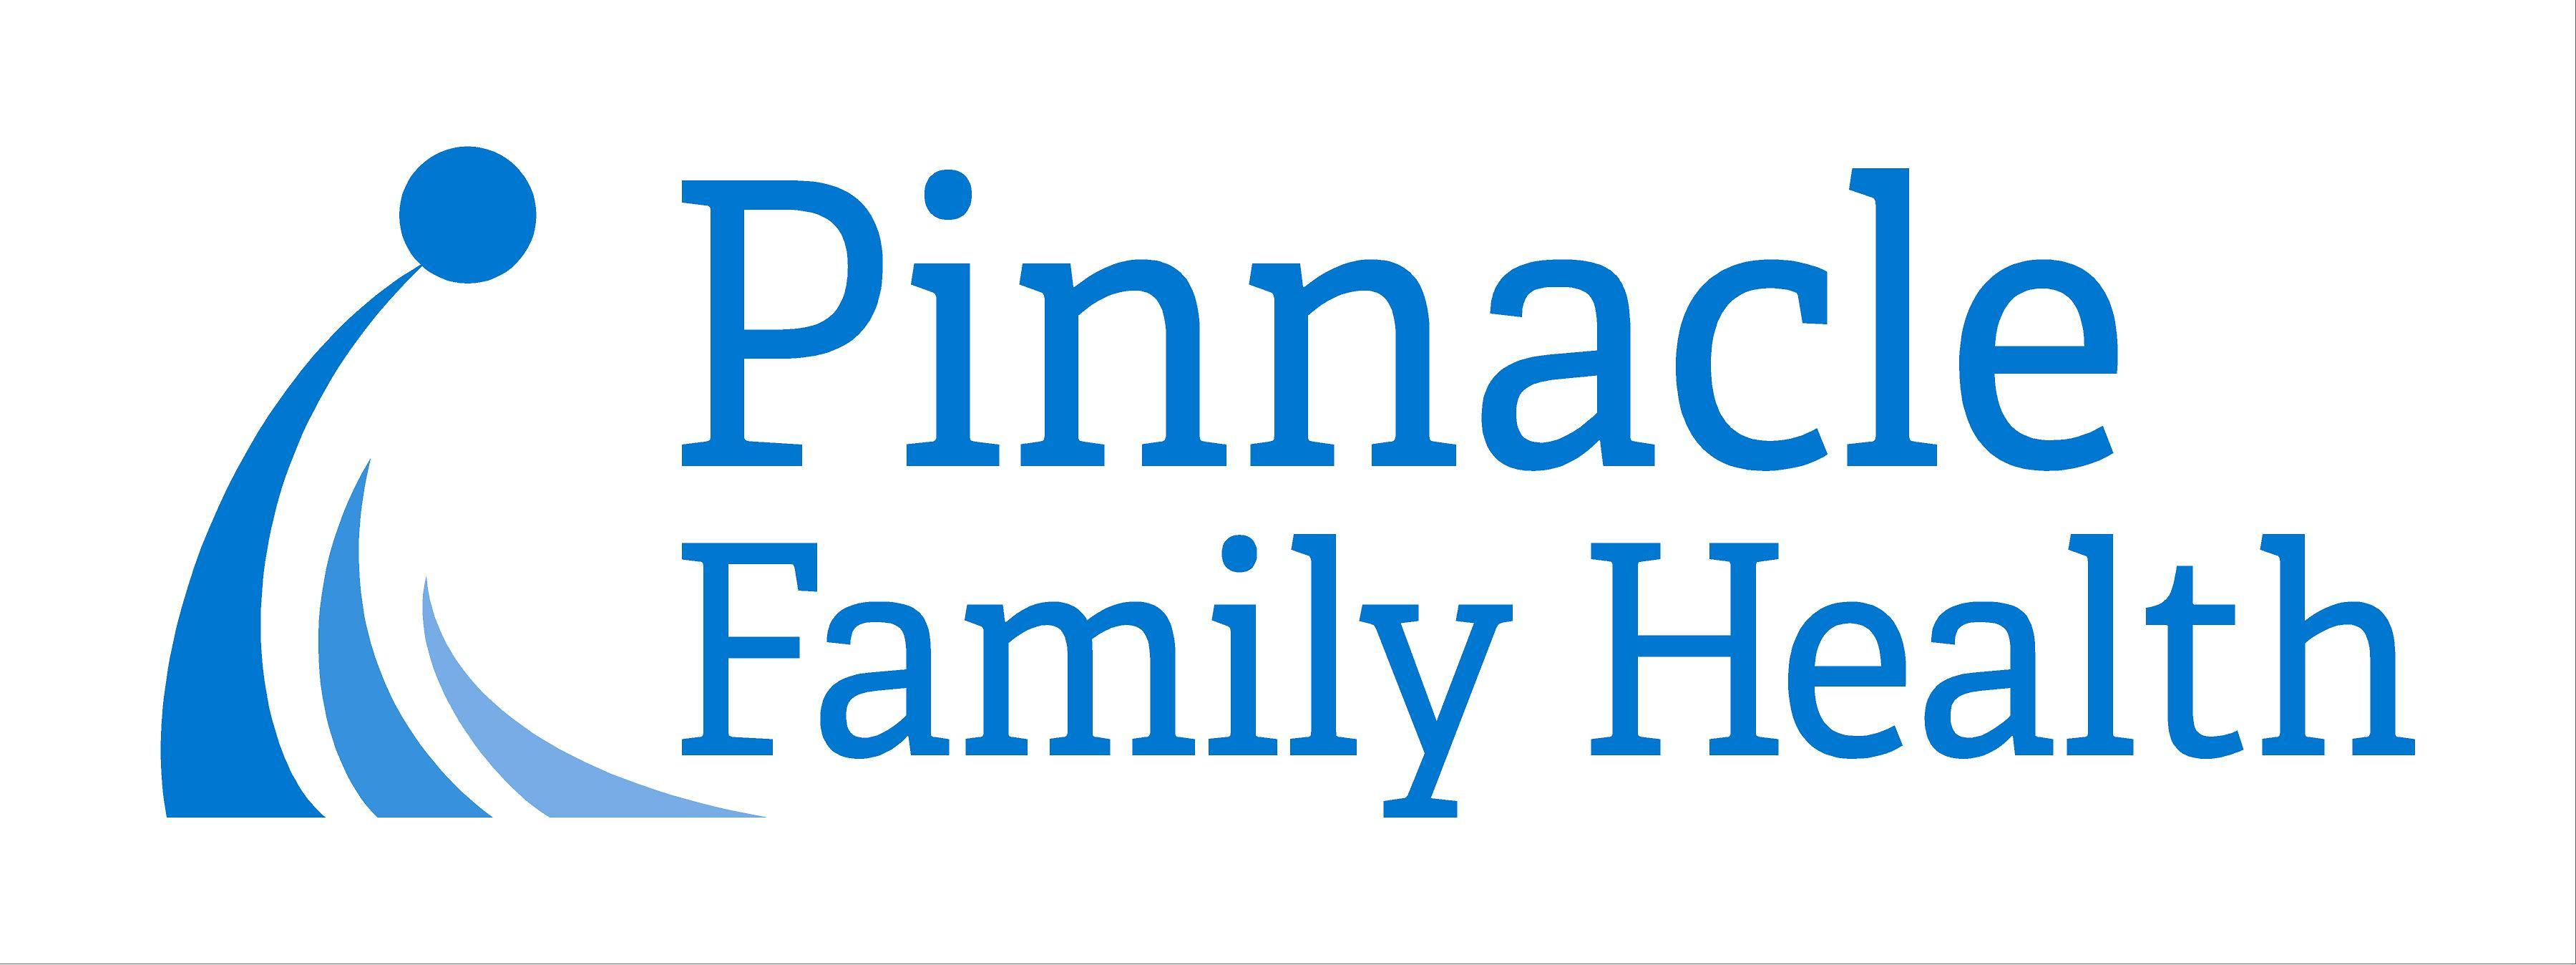 Pinnacle Family Health image 0